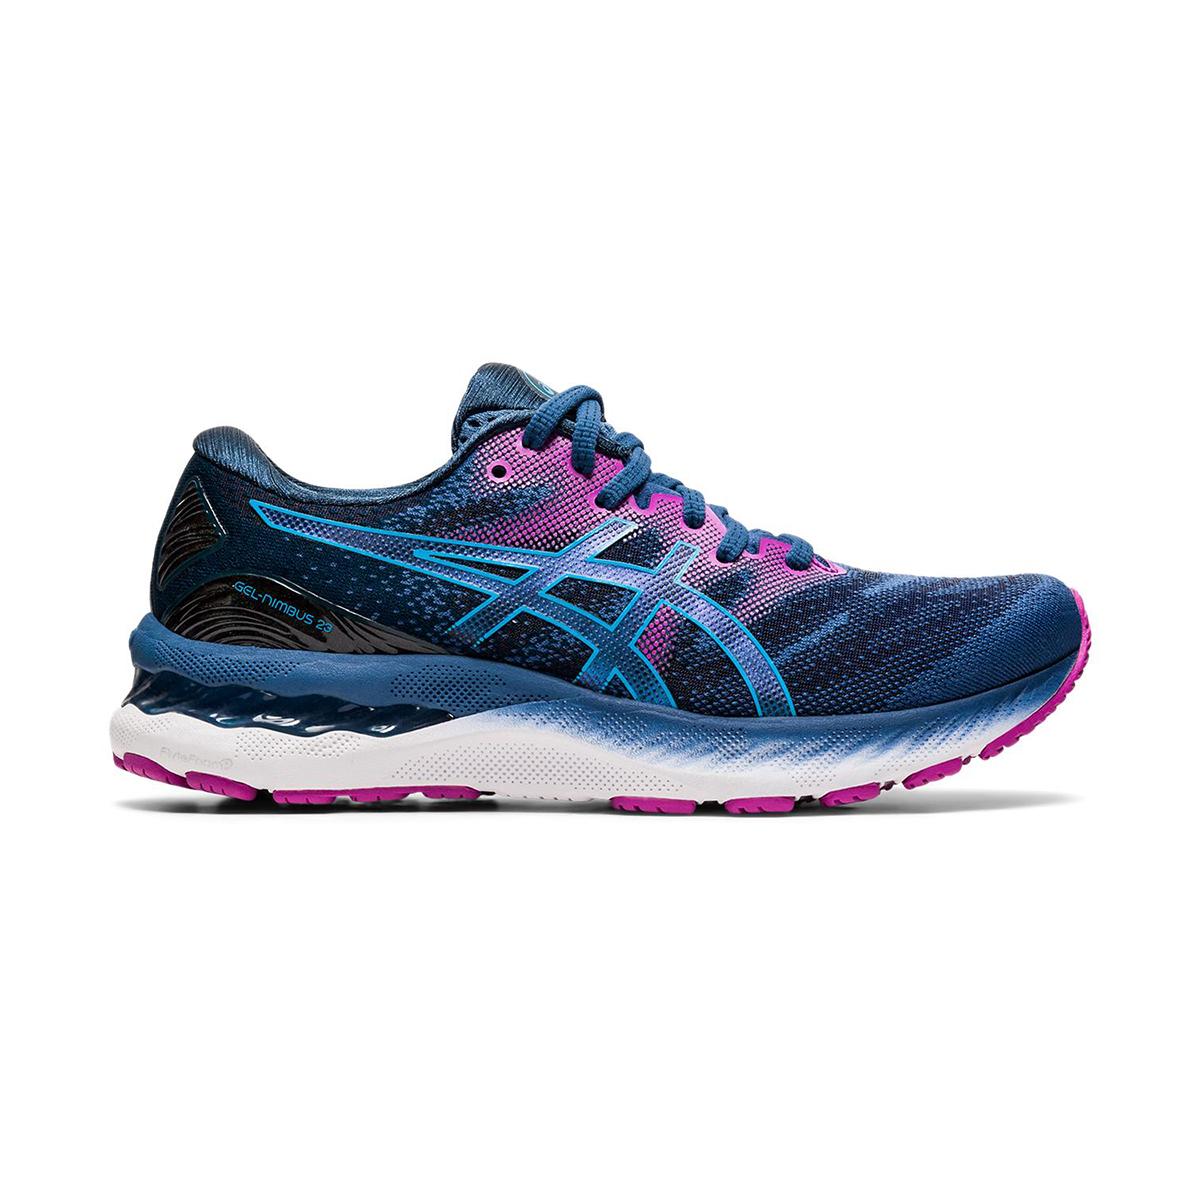 Women's Asics GEL-Nimbus 23 Running Shoe - Color: Grand Shark/Digital Aqua - Size: 5 - Width: Regular, Grand Shark/Digital Aqua, large, image 1